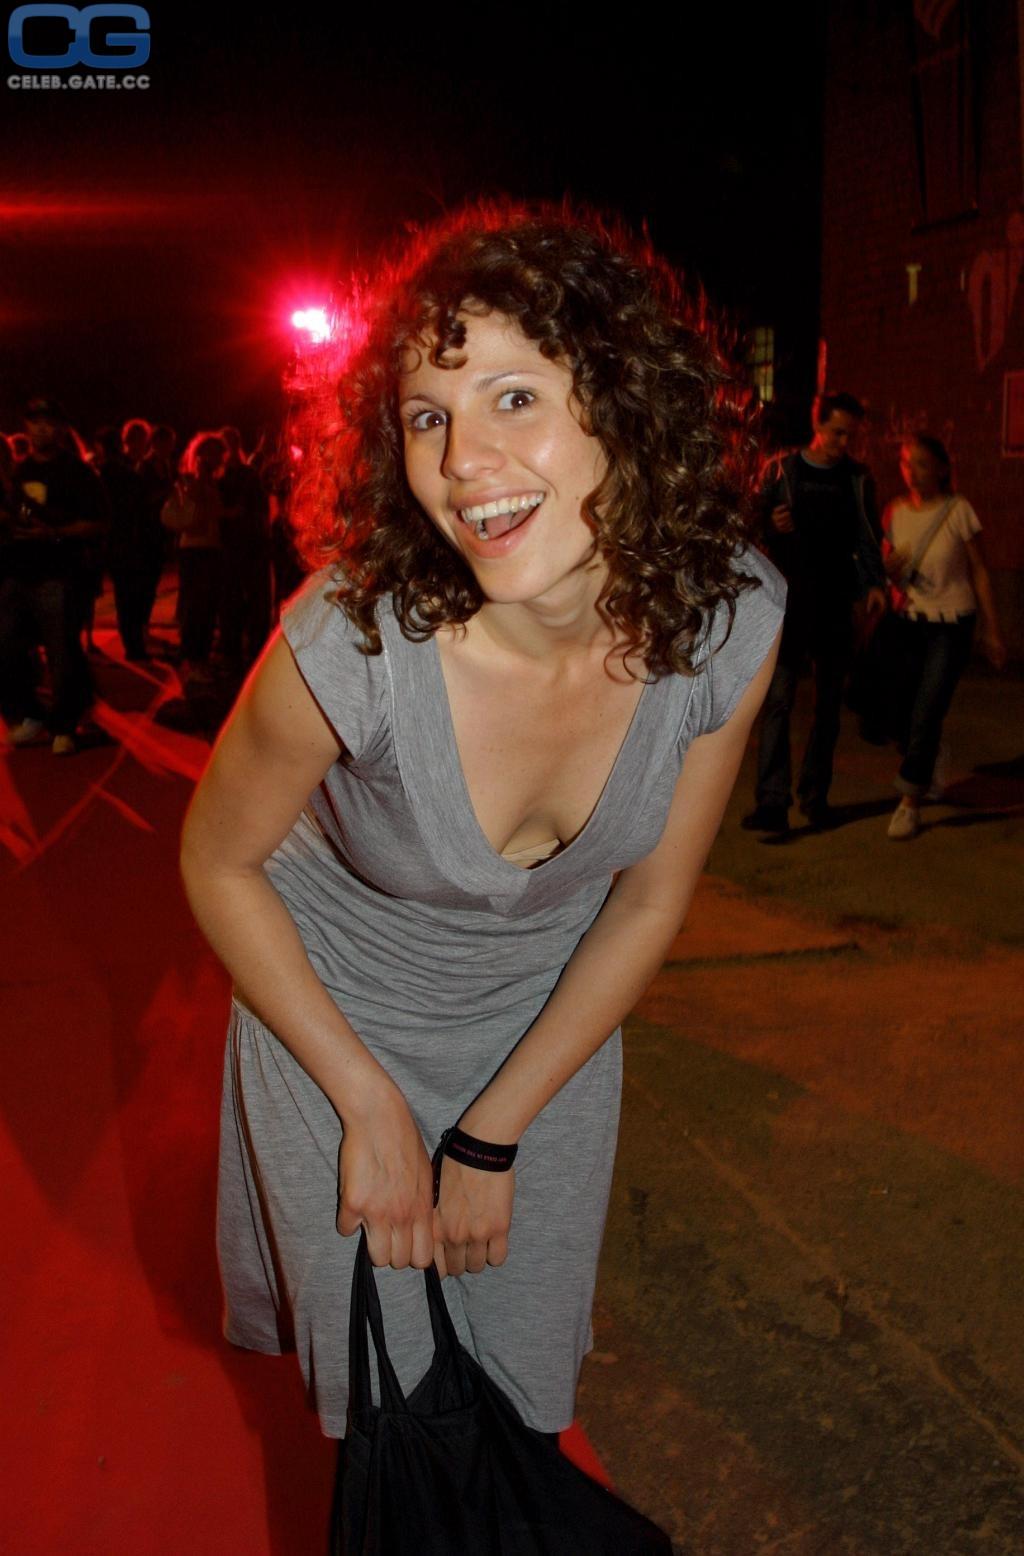 Jasmin gerat nackt bilder